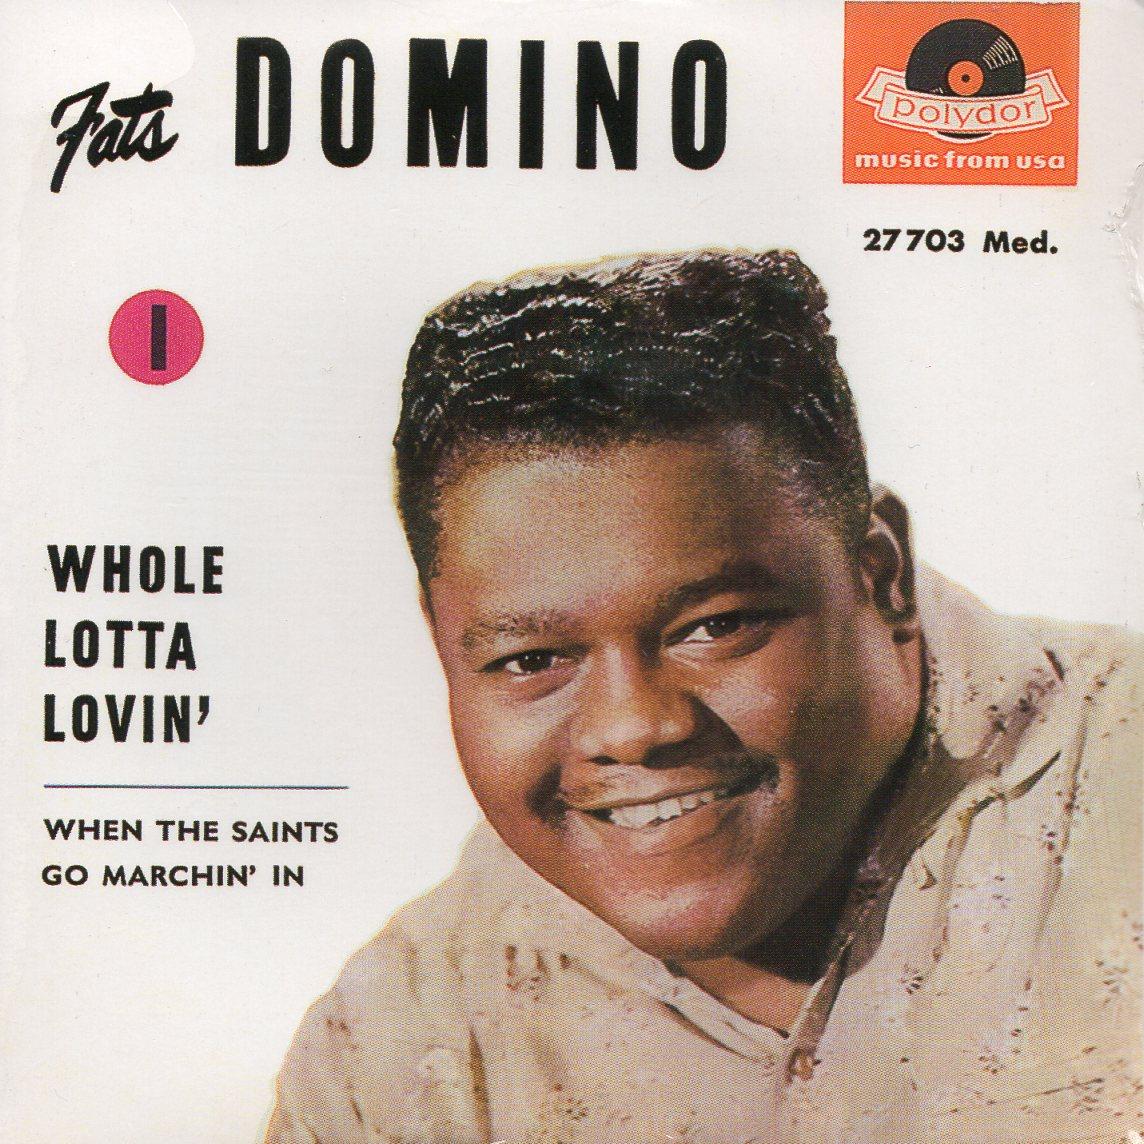 Fats DOMINO - Whole Lotta Lovin' - Ep 4-track Card Sleeve